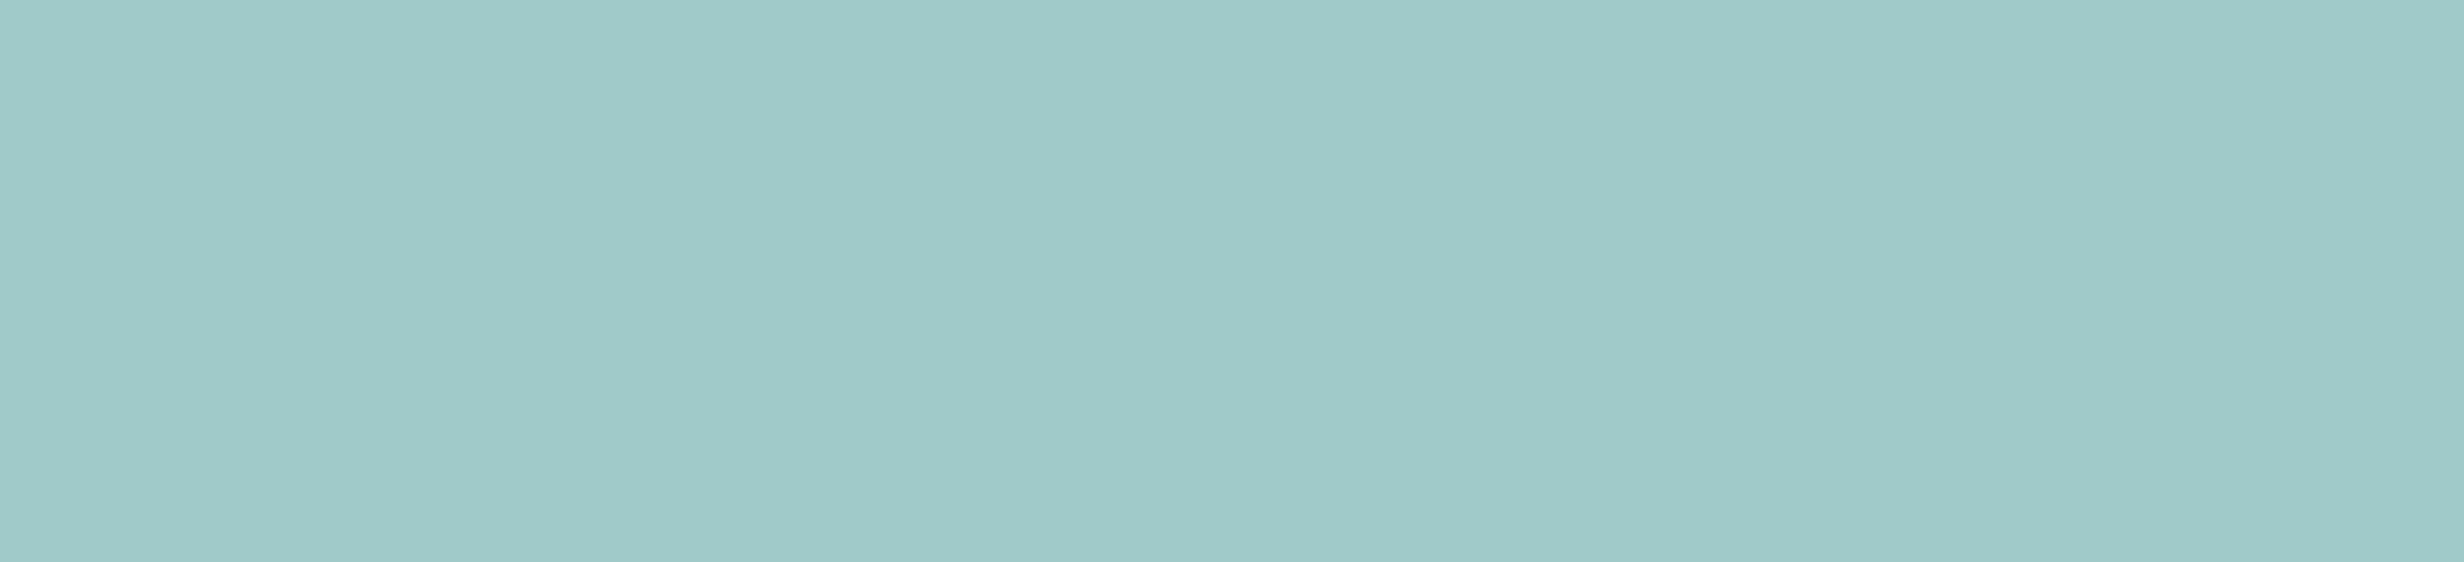 QVC / My Process - DISCOVER ⟶ DEFINE ⟶ ARCHITECT ⟶ DESIGN